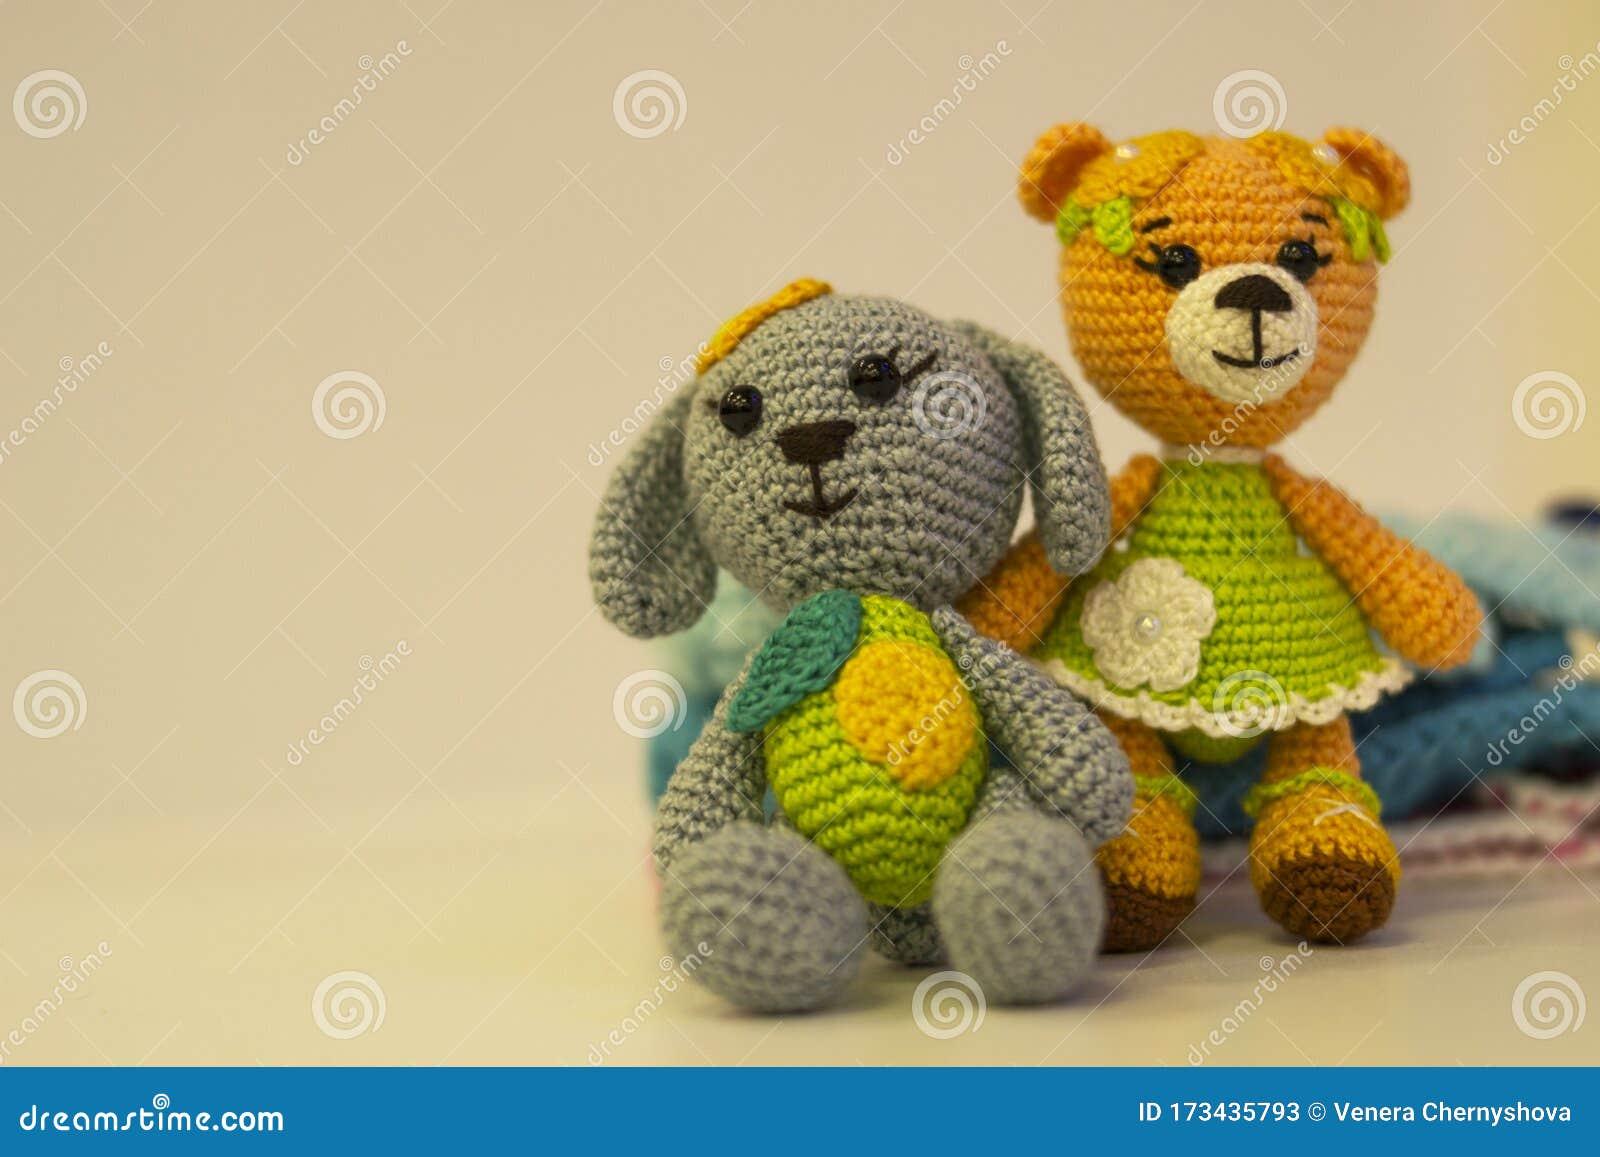 Crochet Amigurumi Puppy Dog PATTERN ONLY, Jack Pup, pdf Stuffed ... | 1155x1600